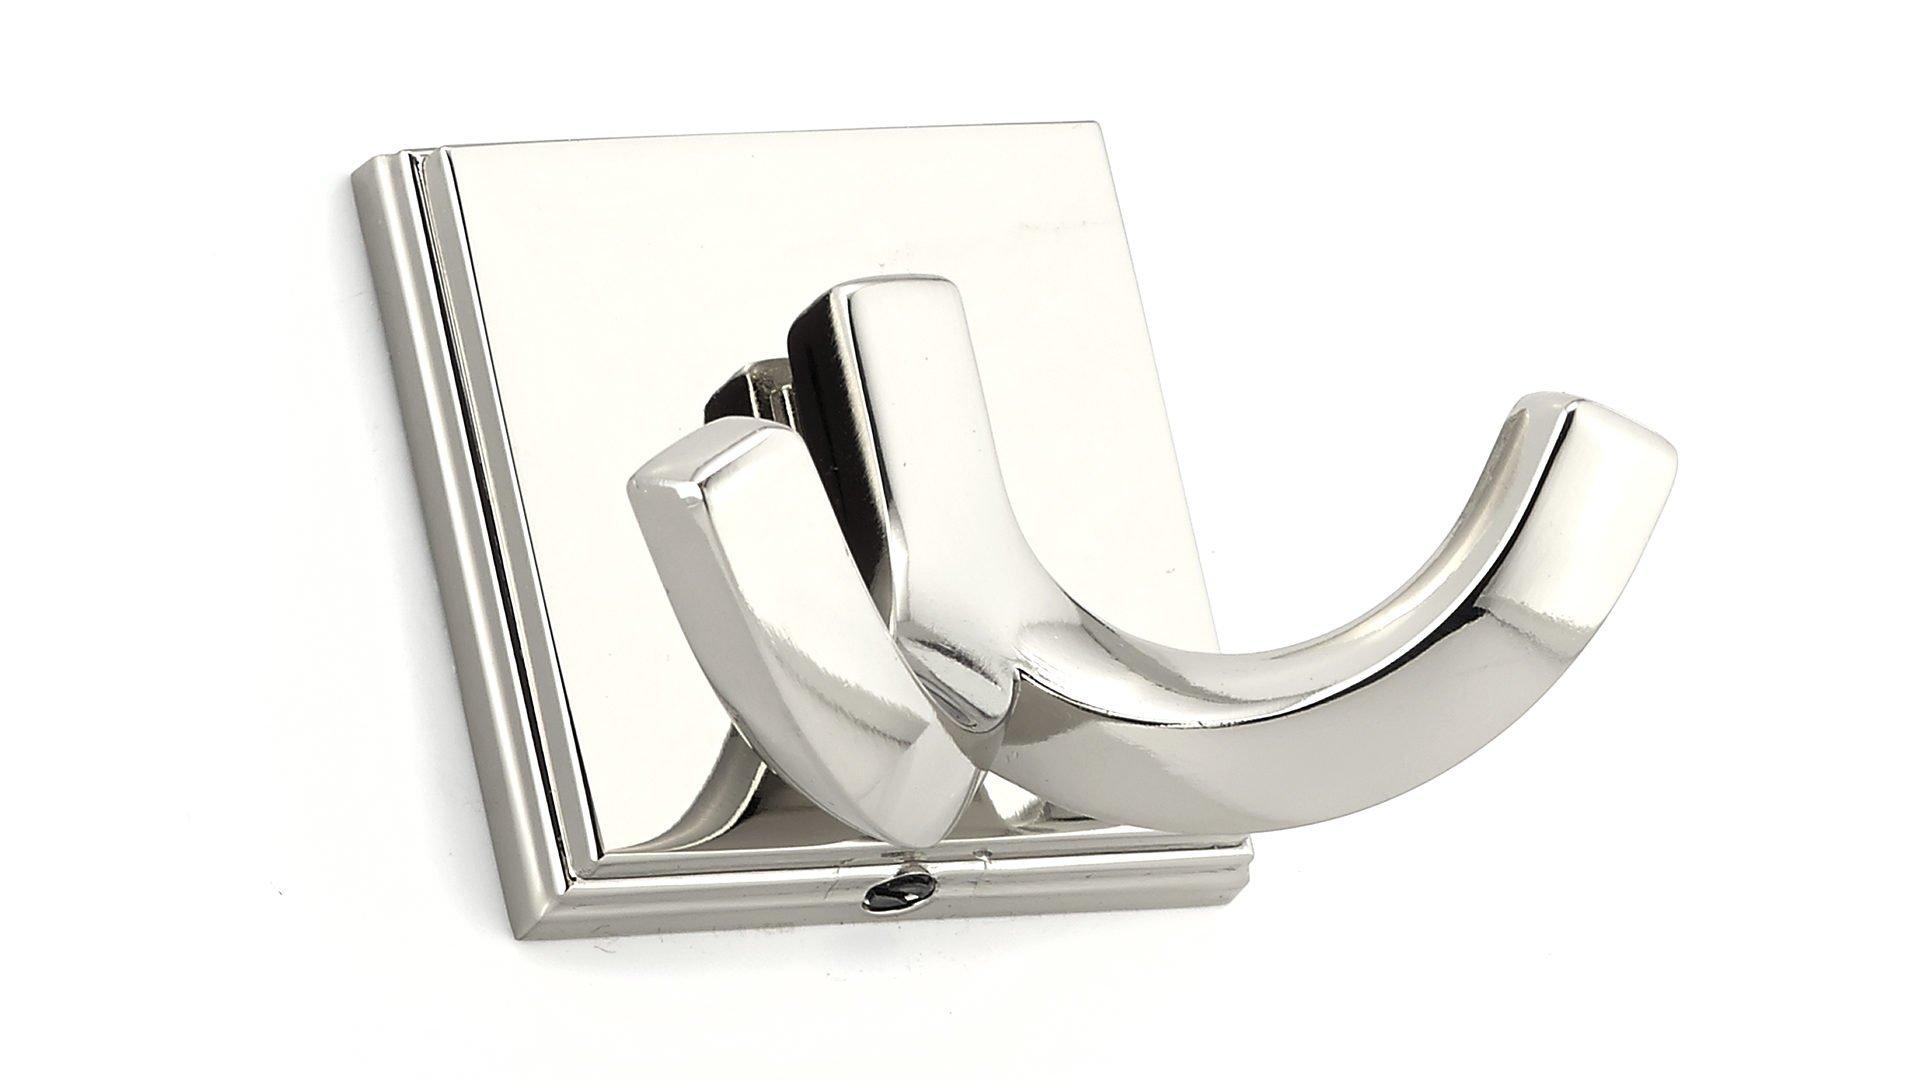 Richelieu Hardware - BP7952180 - Transitional Metal Hook - 7952 - Polished Nickel Finish